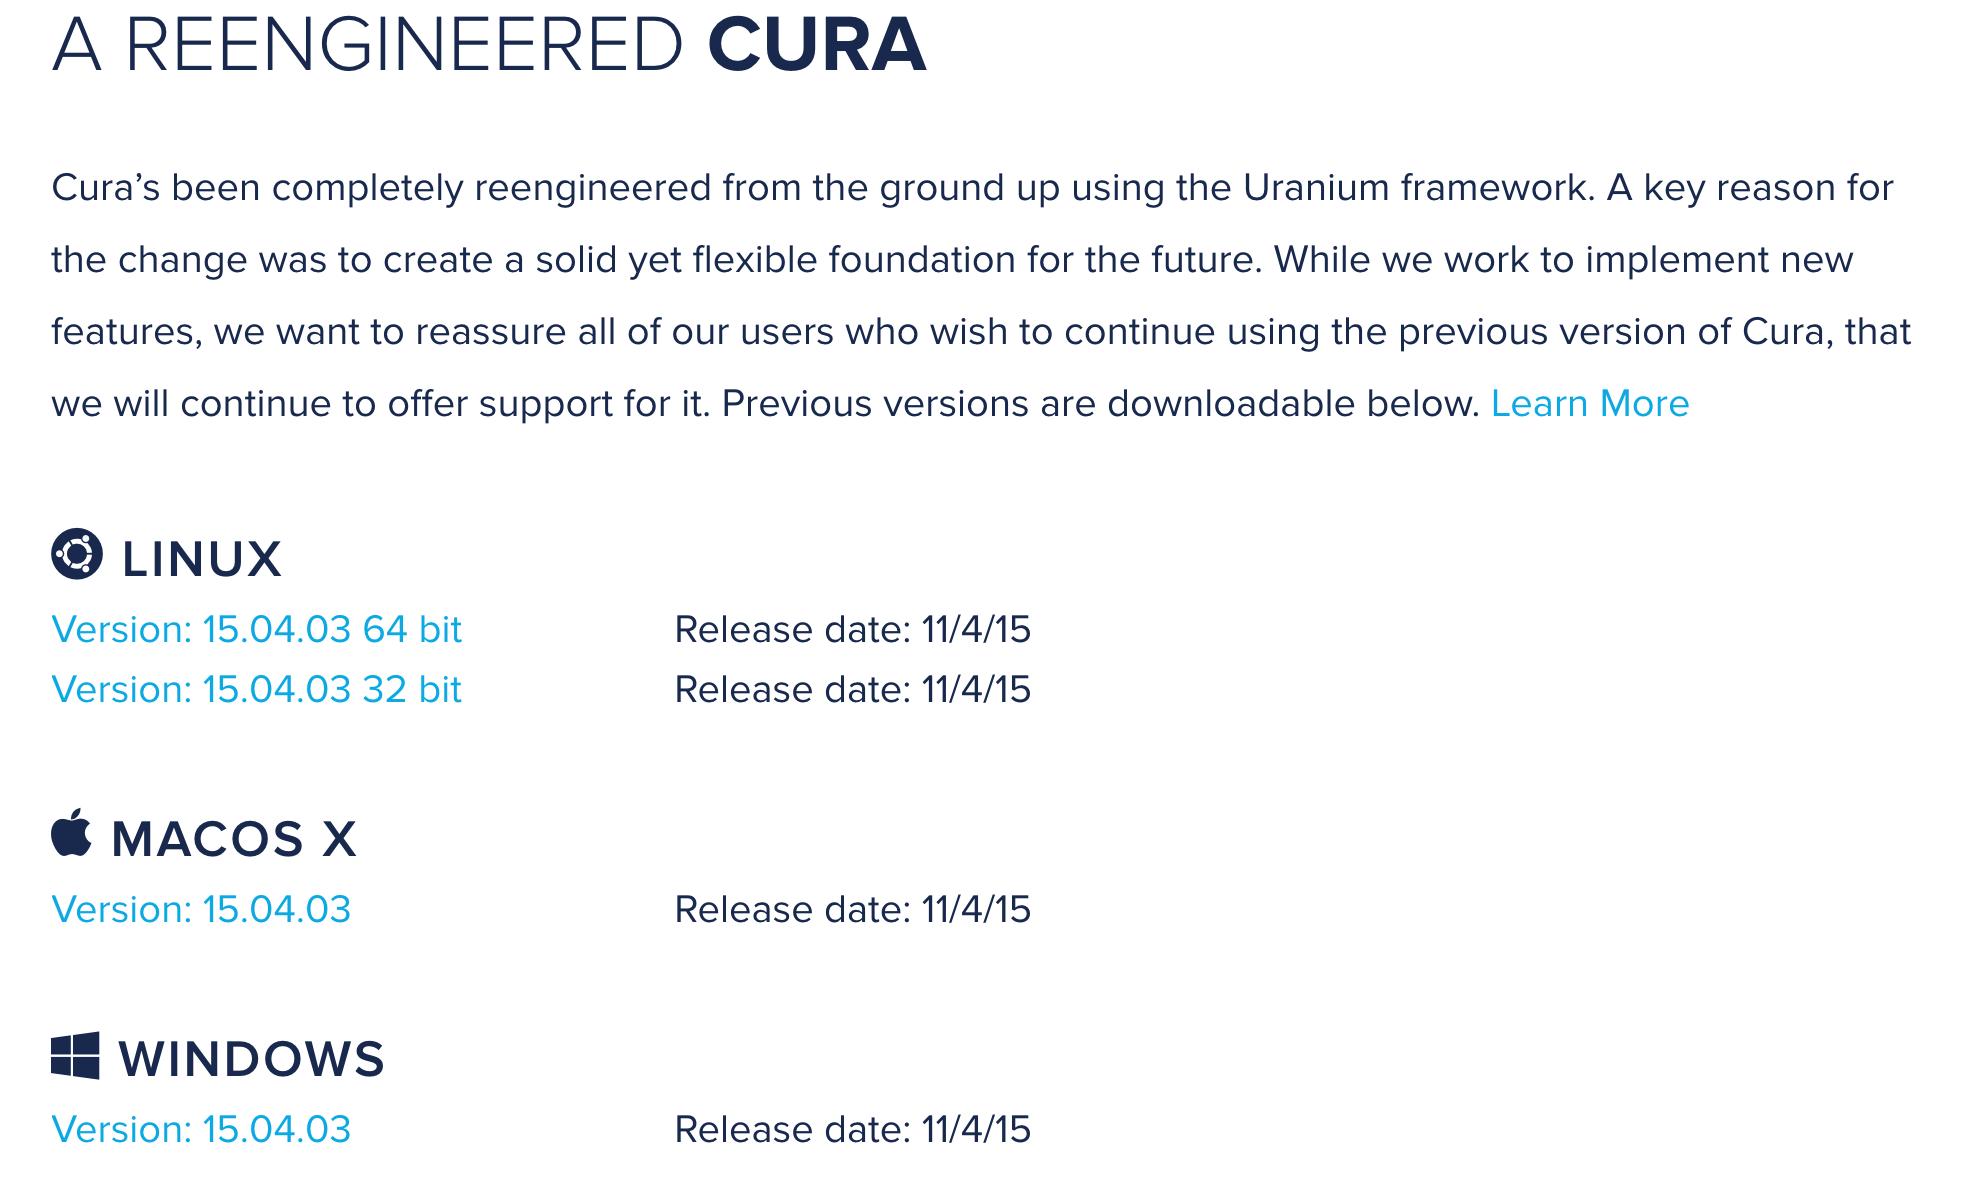 Download Cura